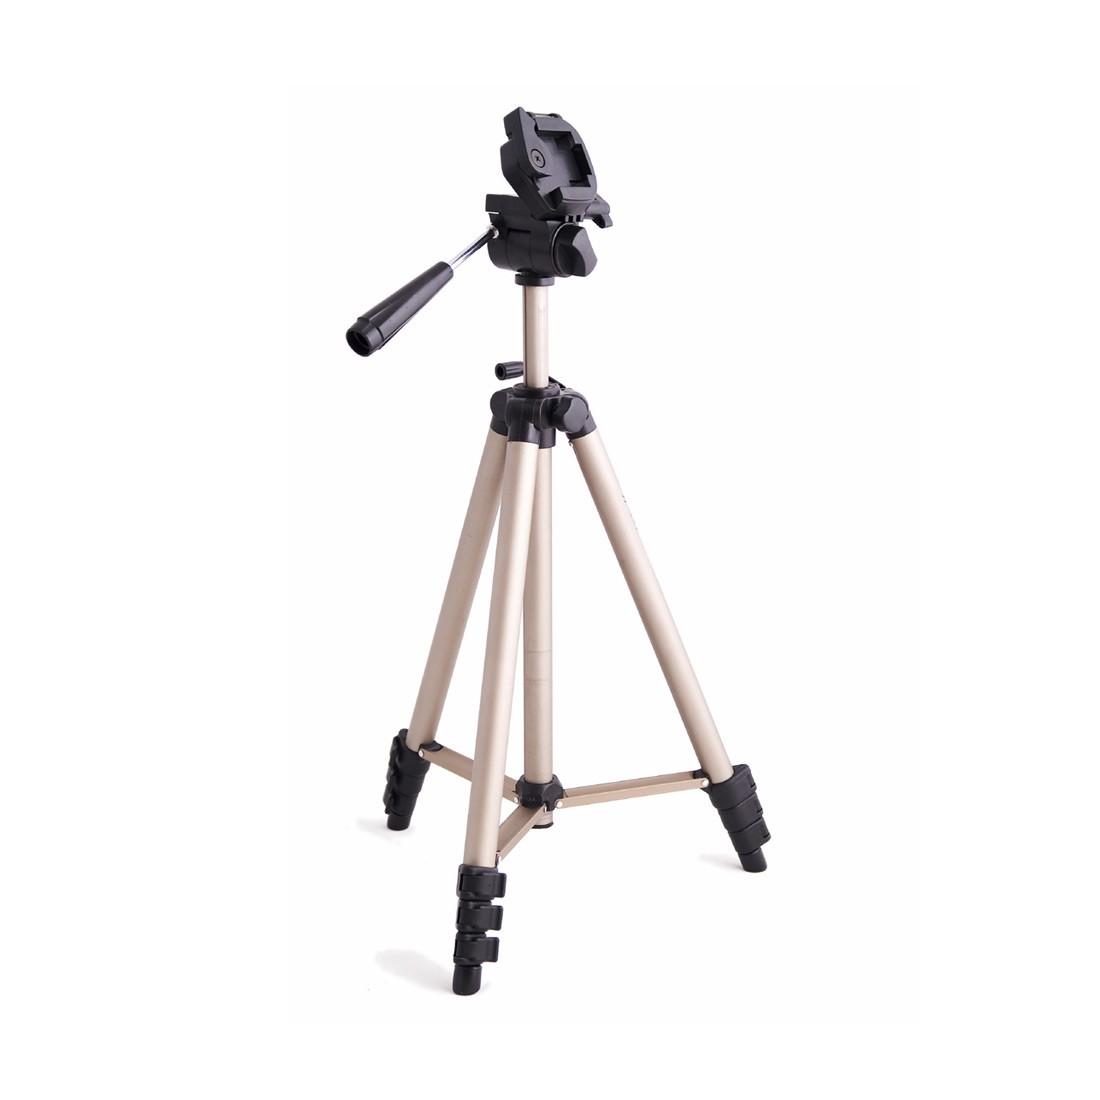 SLR Camera Tripod